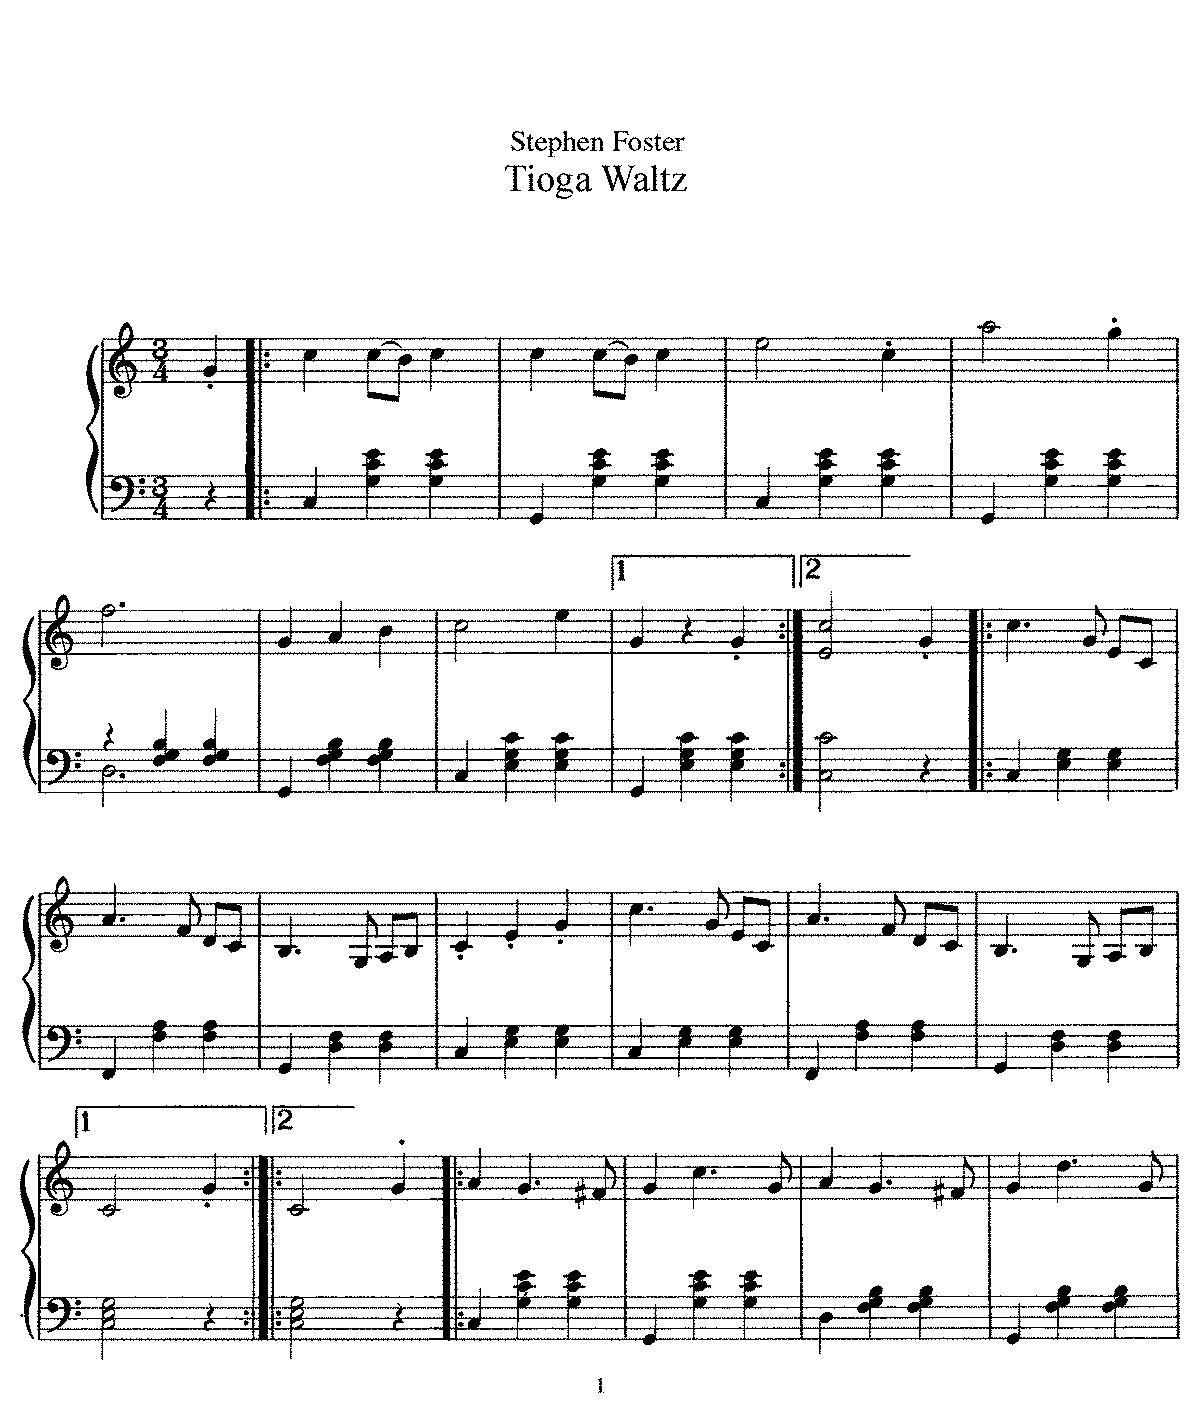 Tioga Waltz (Foster, Stephen) - IMSLP/Petrucci Music Library: Free